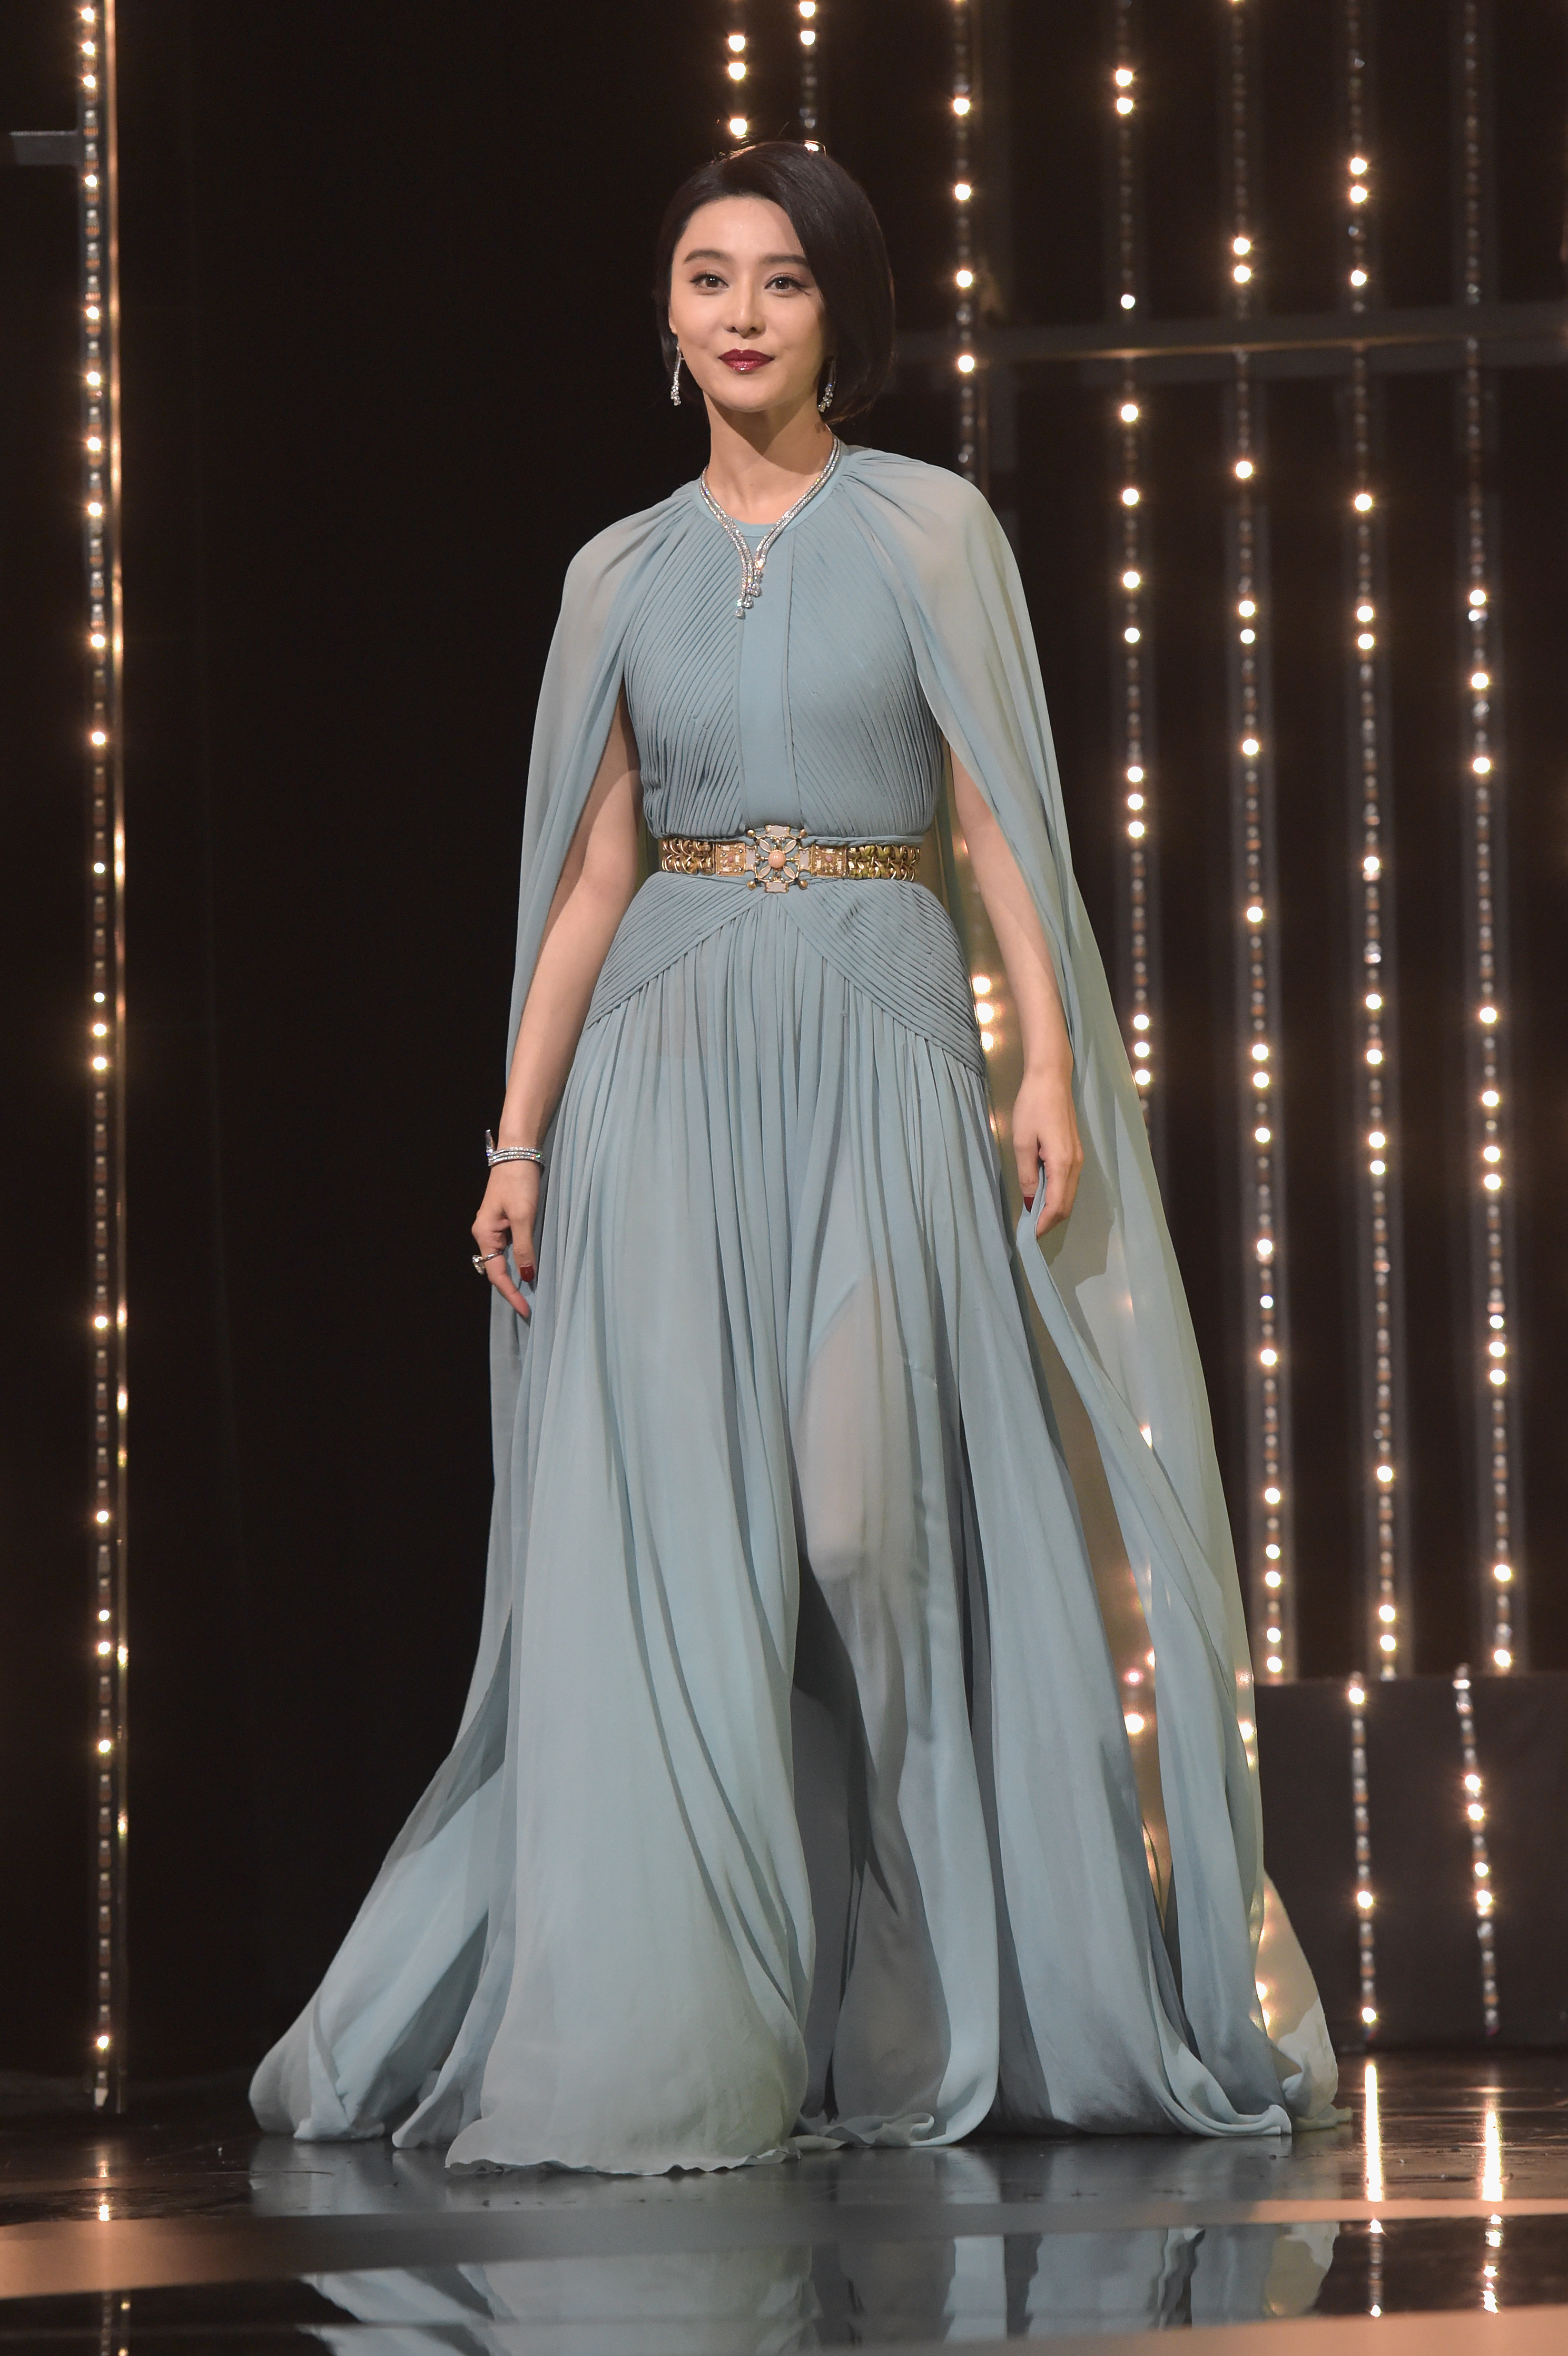 Fan Bingbing in Elie Saab Couture